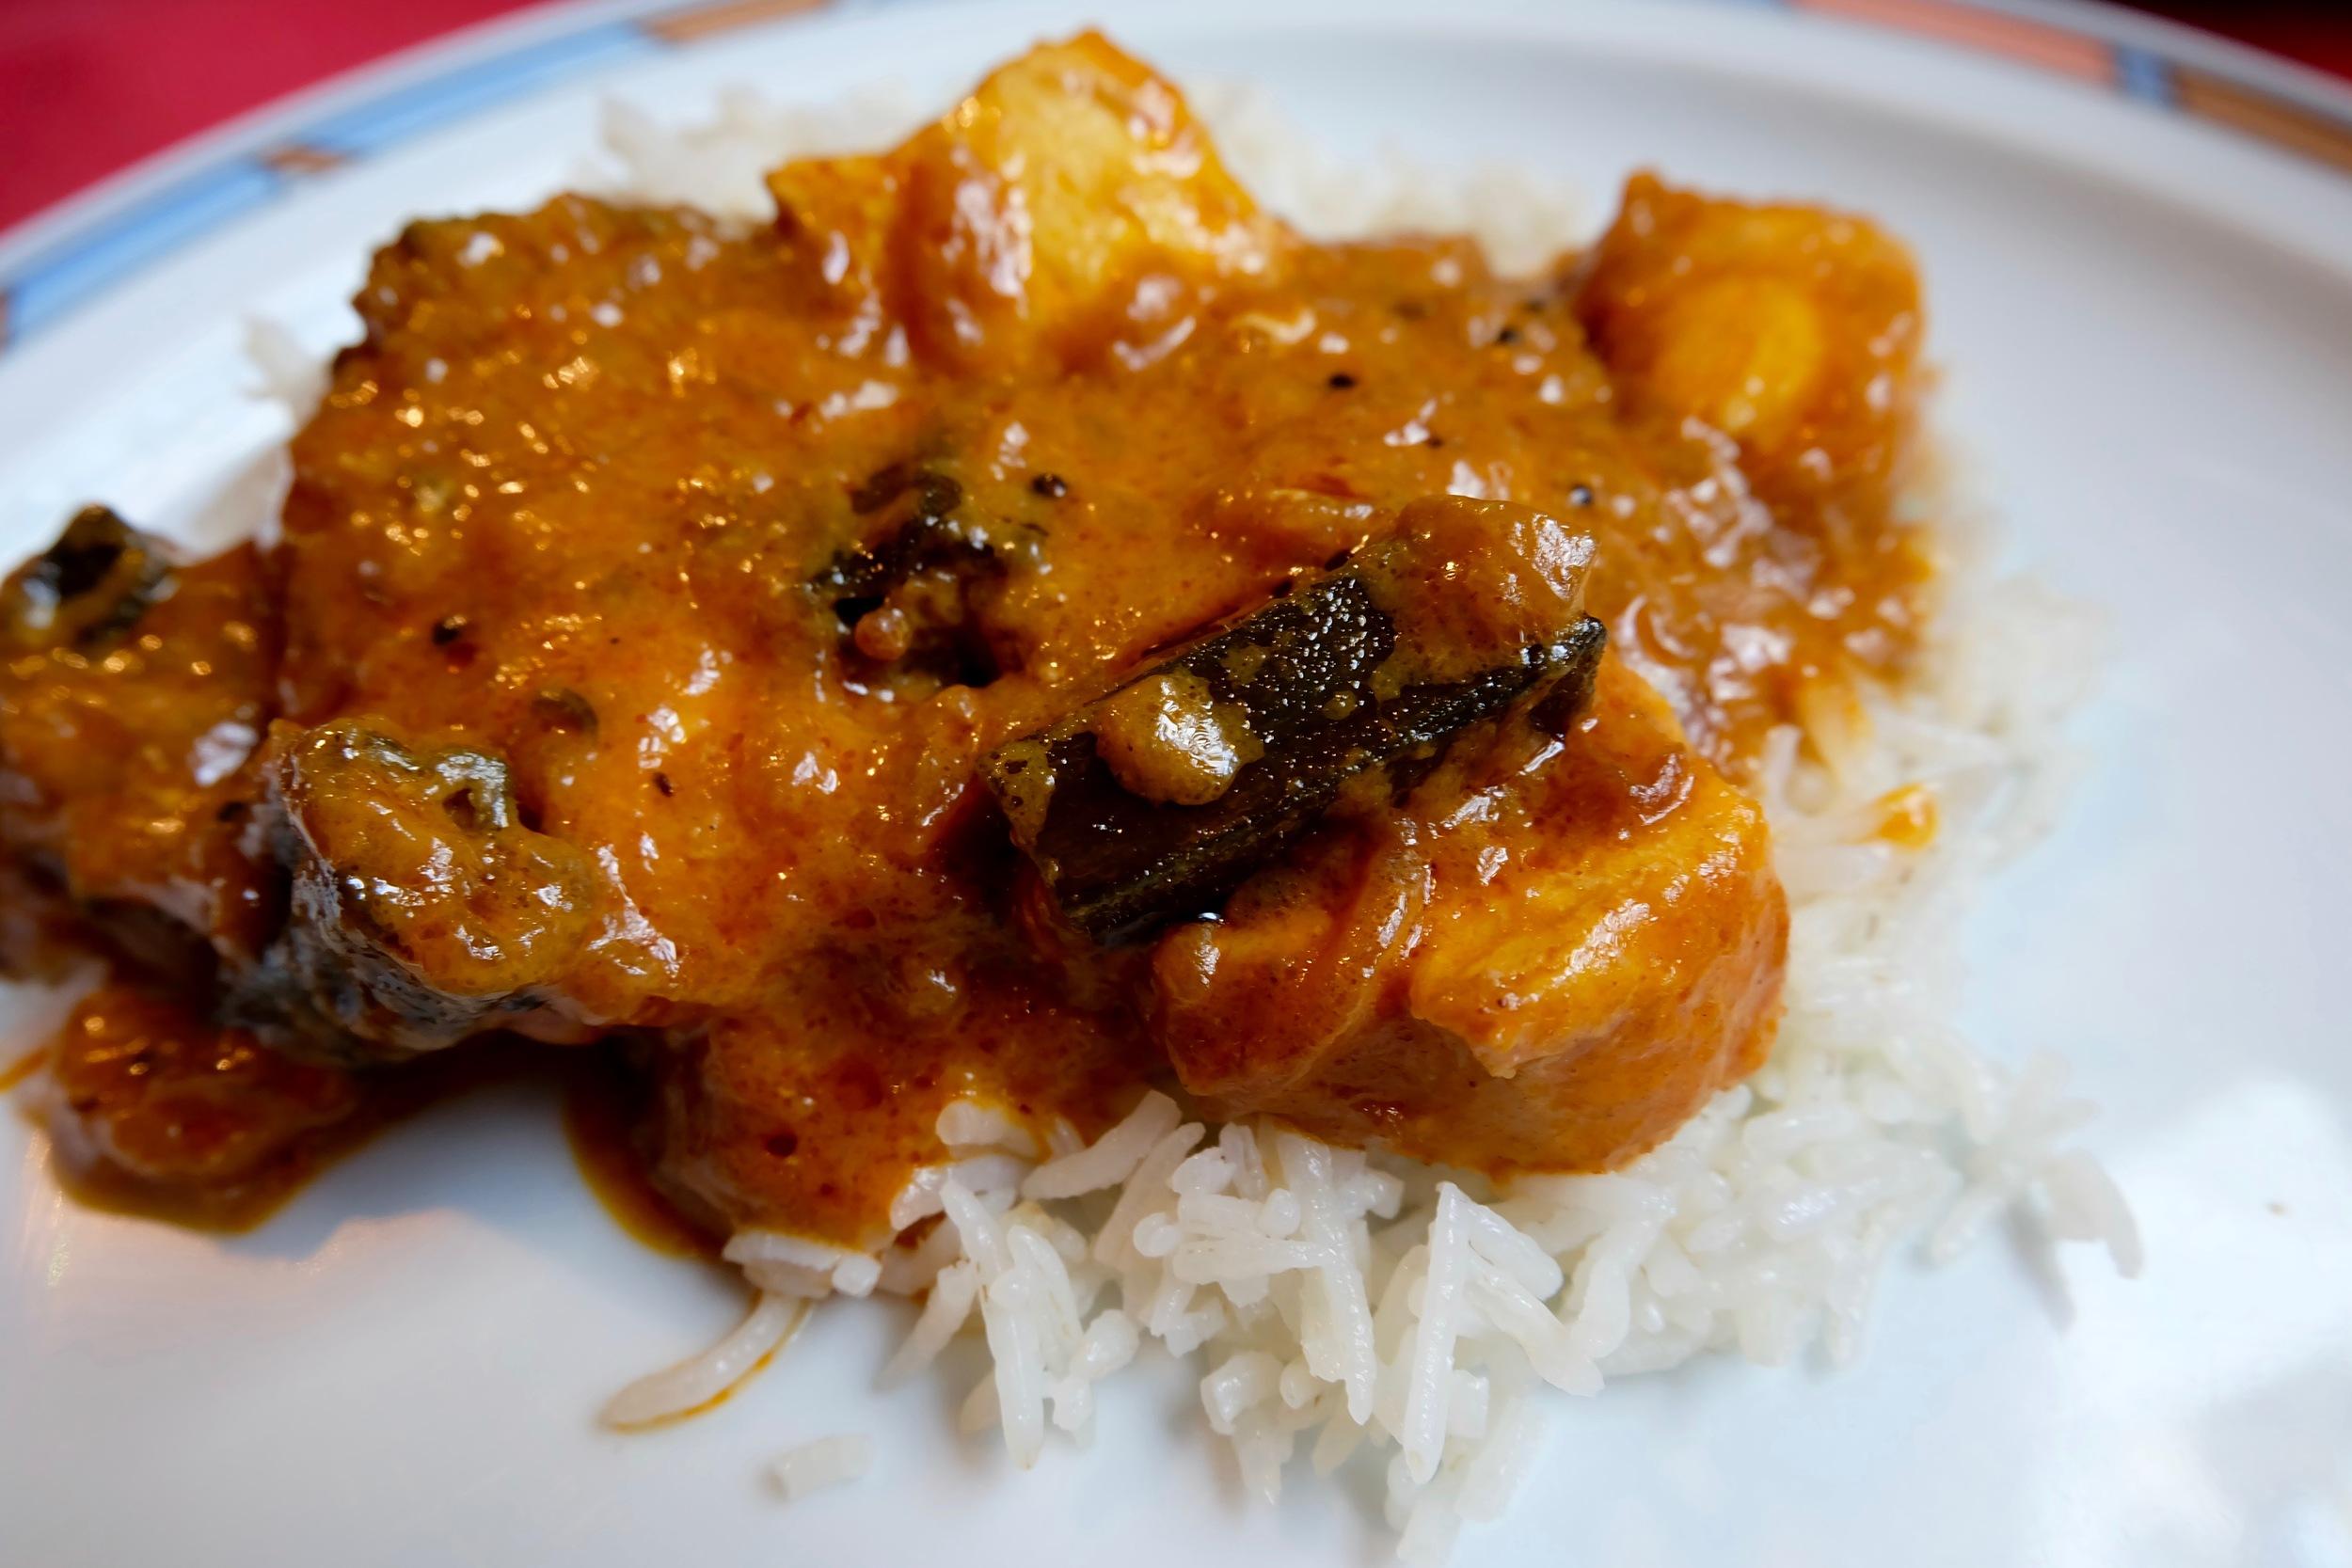 A close up of my  Chicken Bhindi on rice